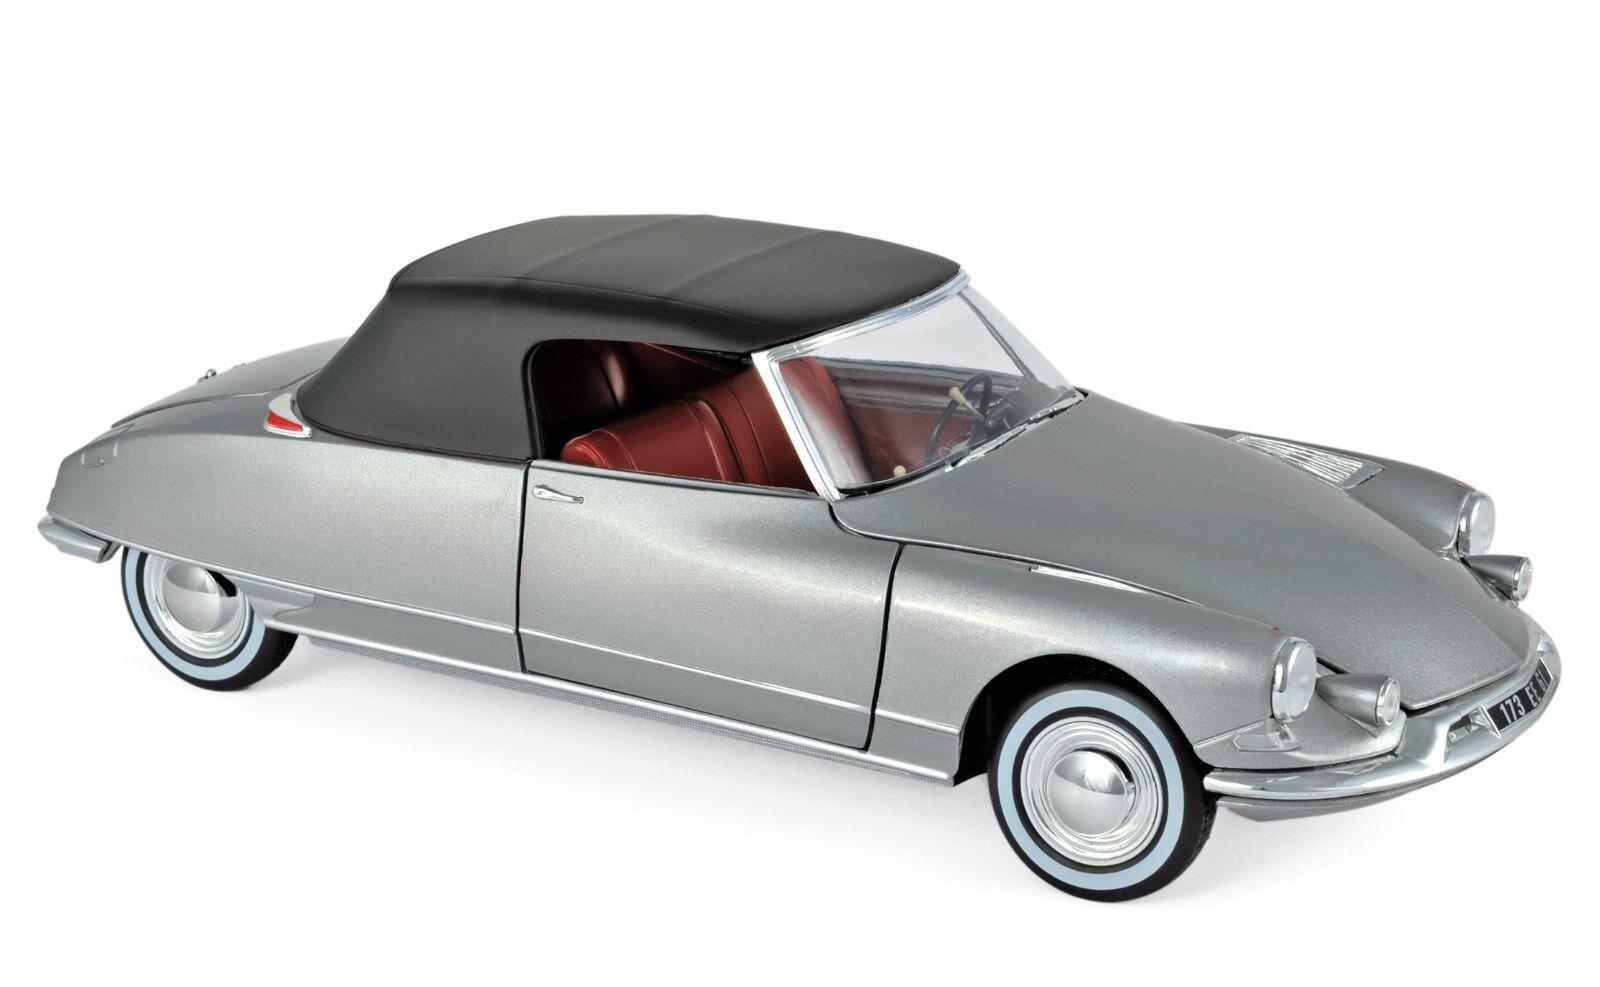 CITROEN DS 19 1961 Cabrio grismet. 181598 NOREV 1 18